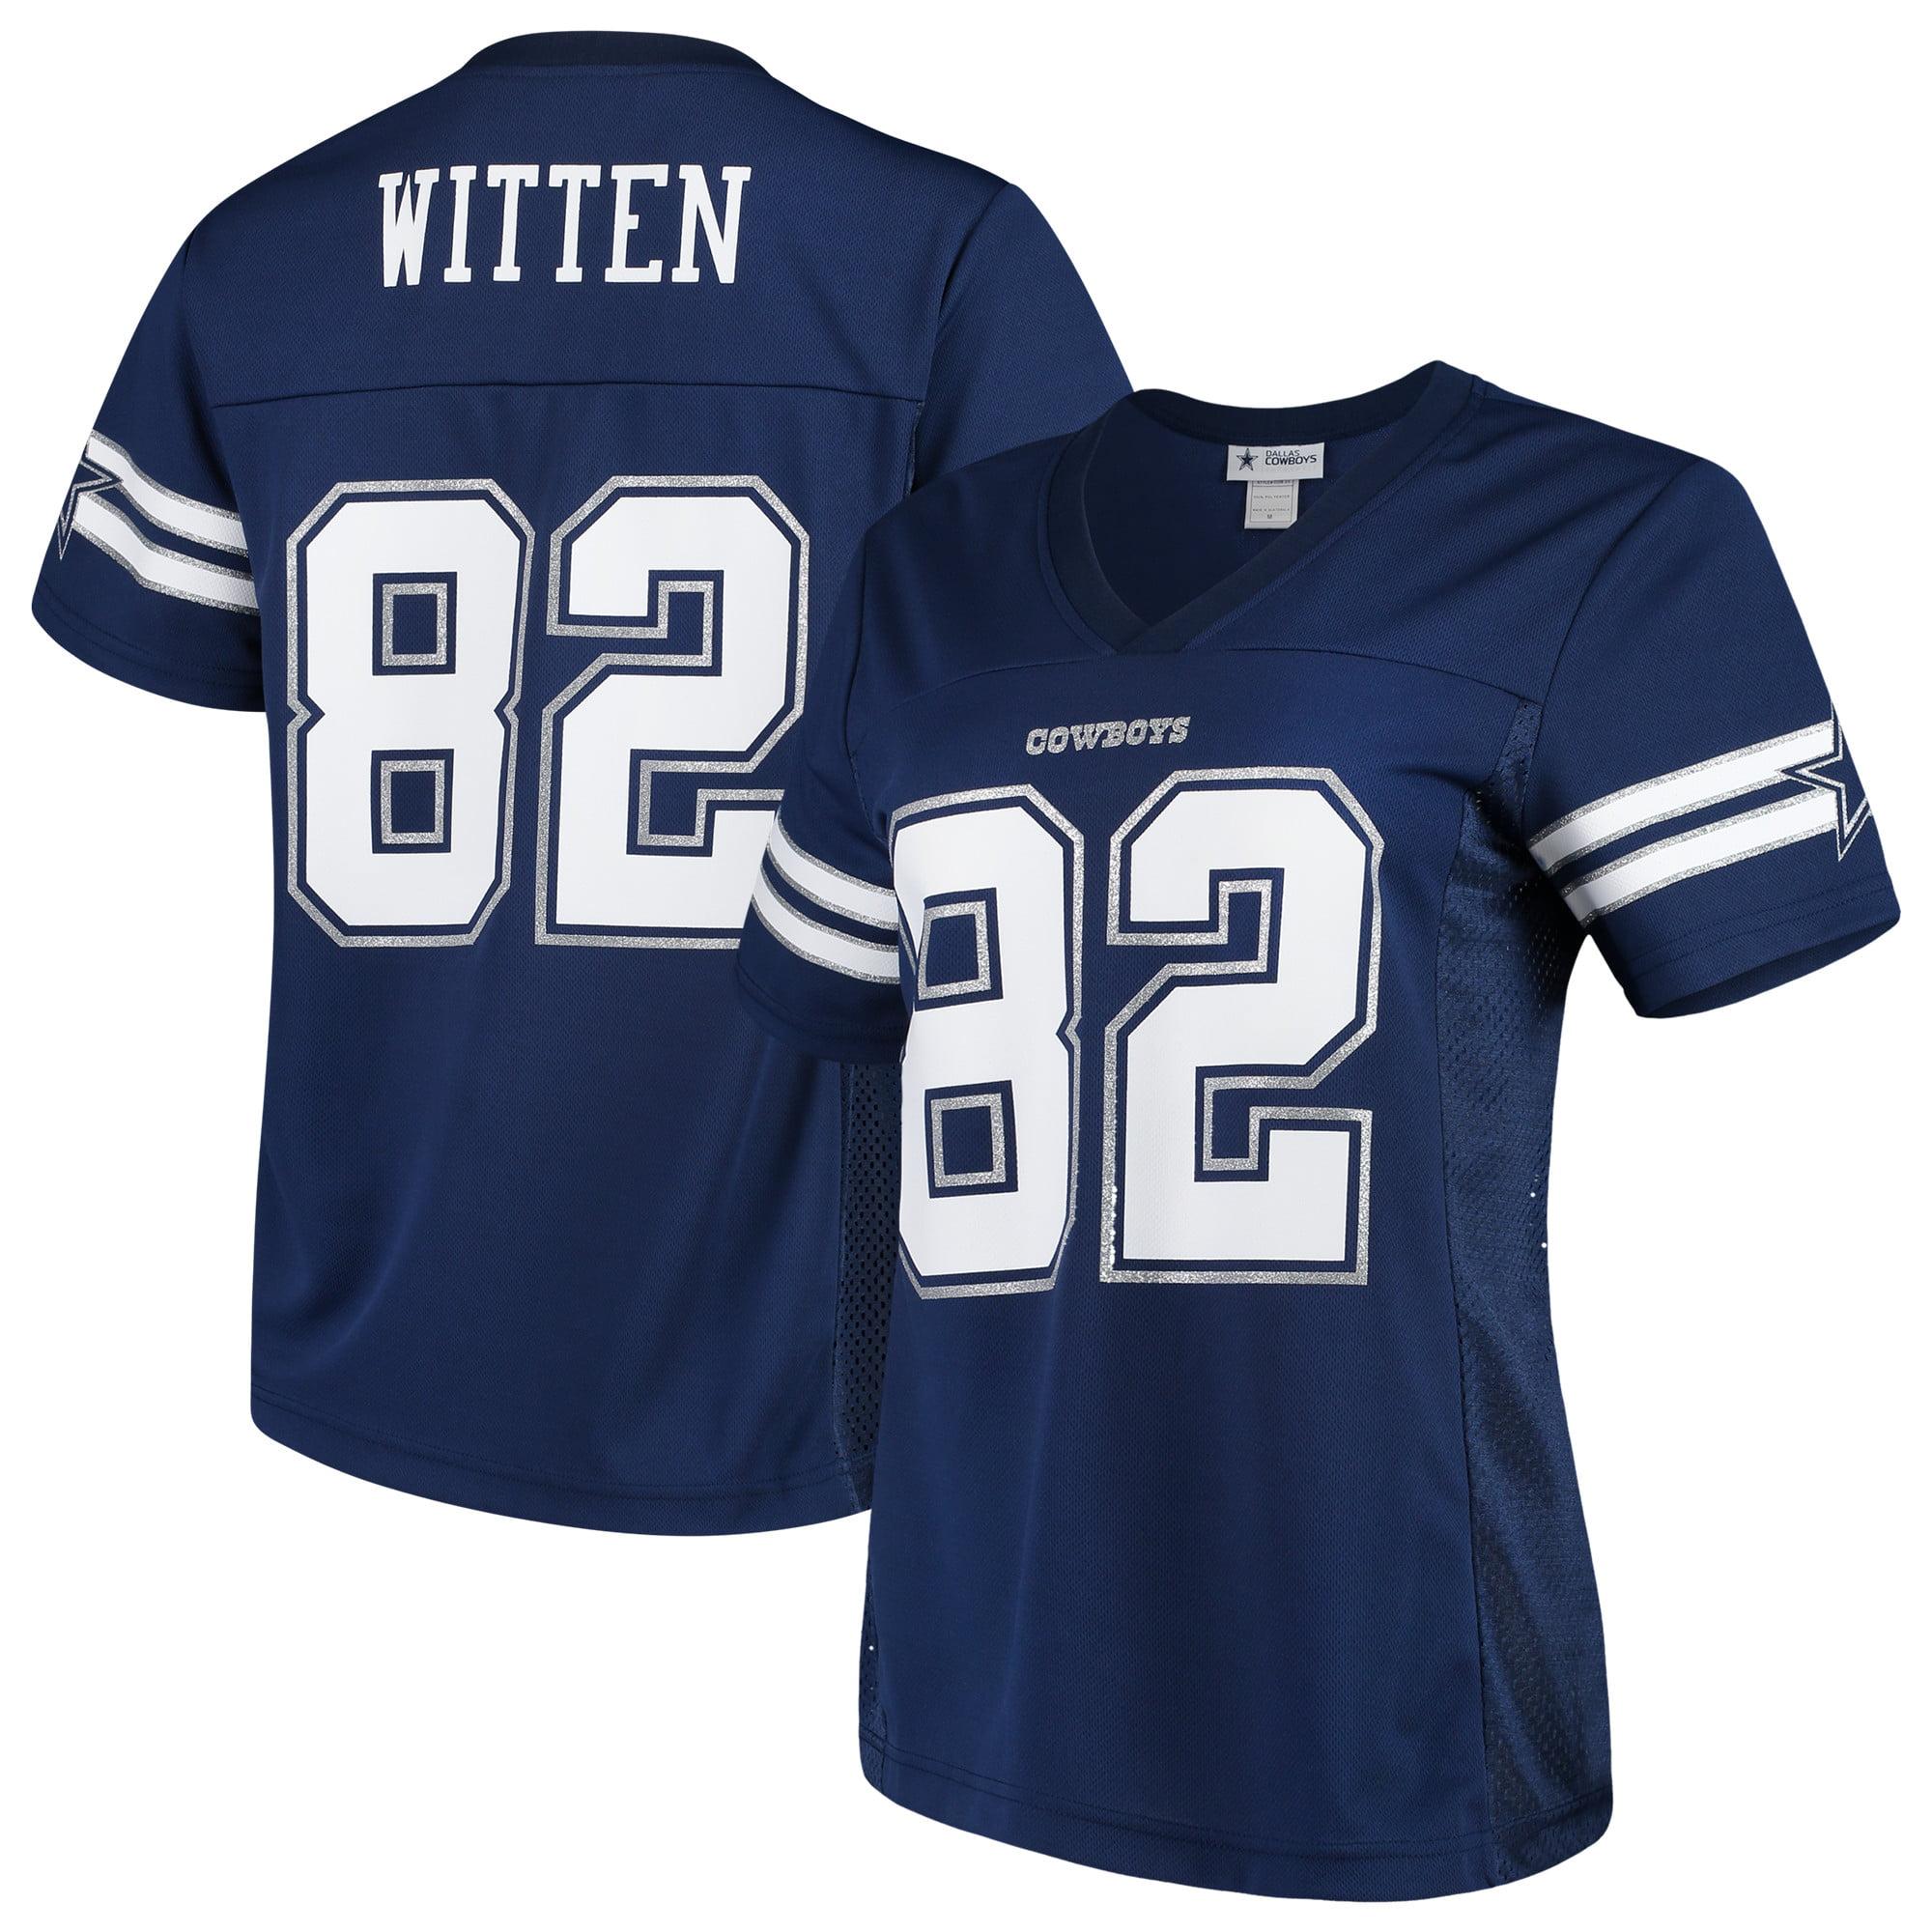 best website 8b917 86cef Women's Jason Witten Navy Dallas Cowboys Player Jersey